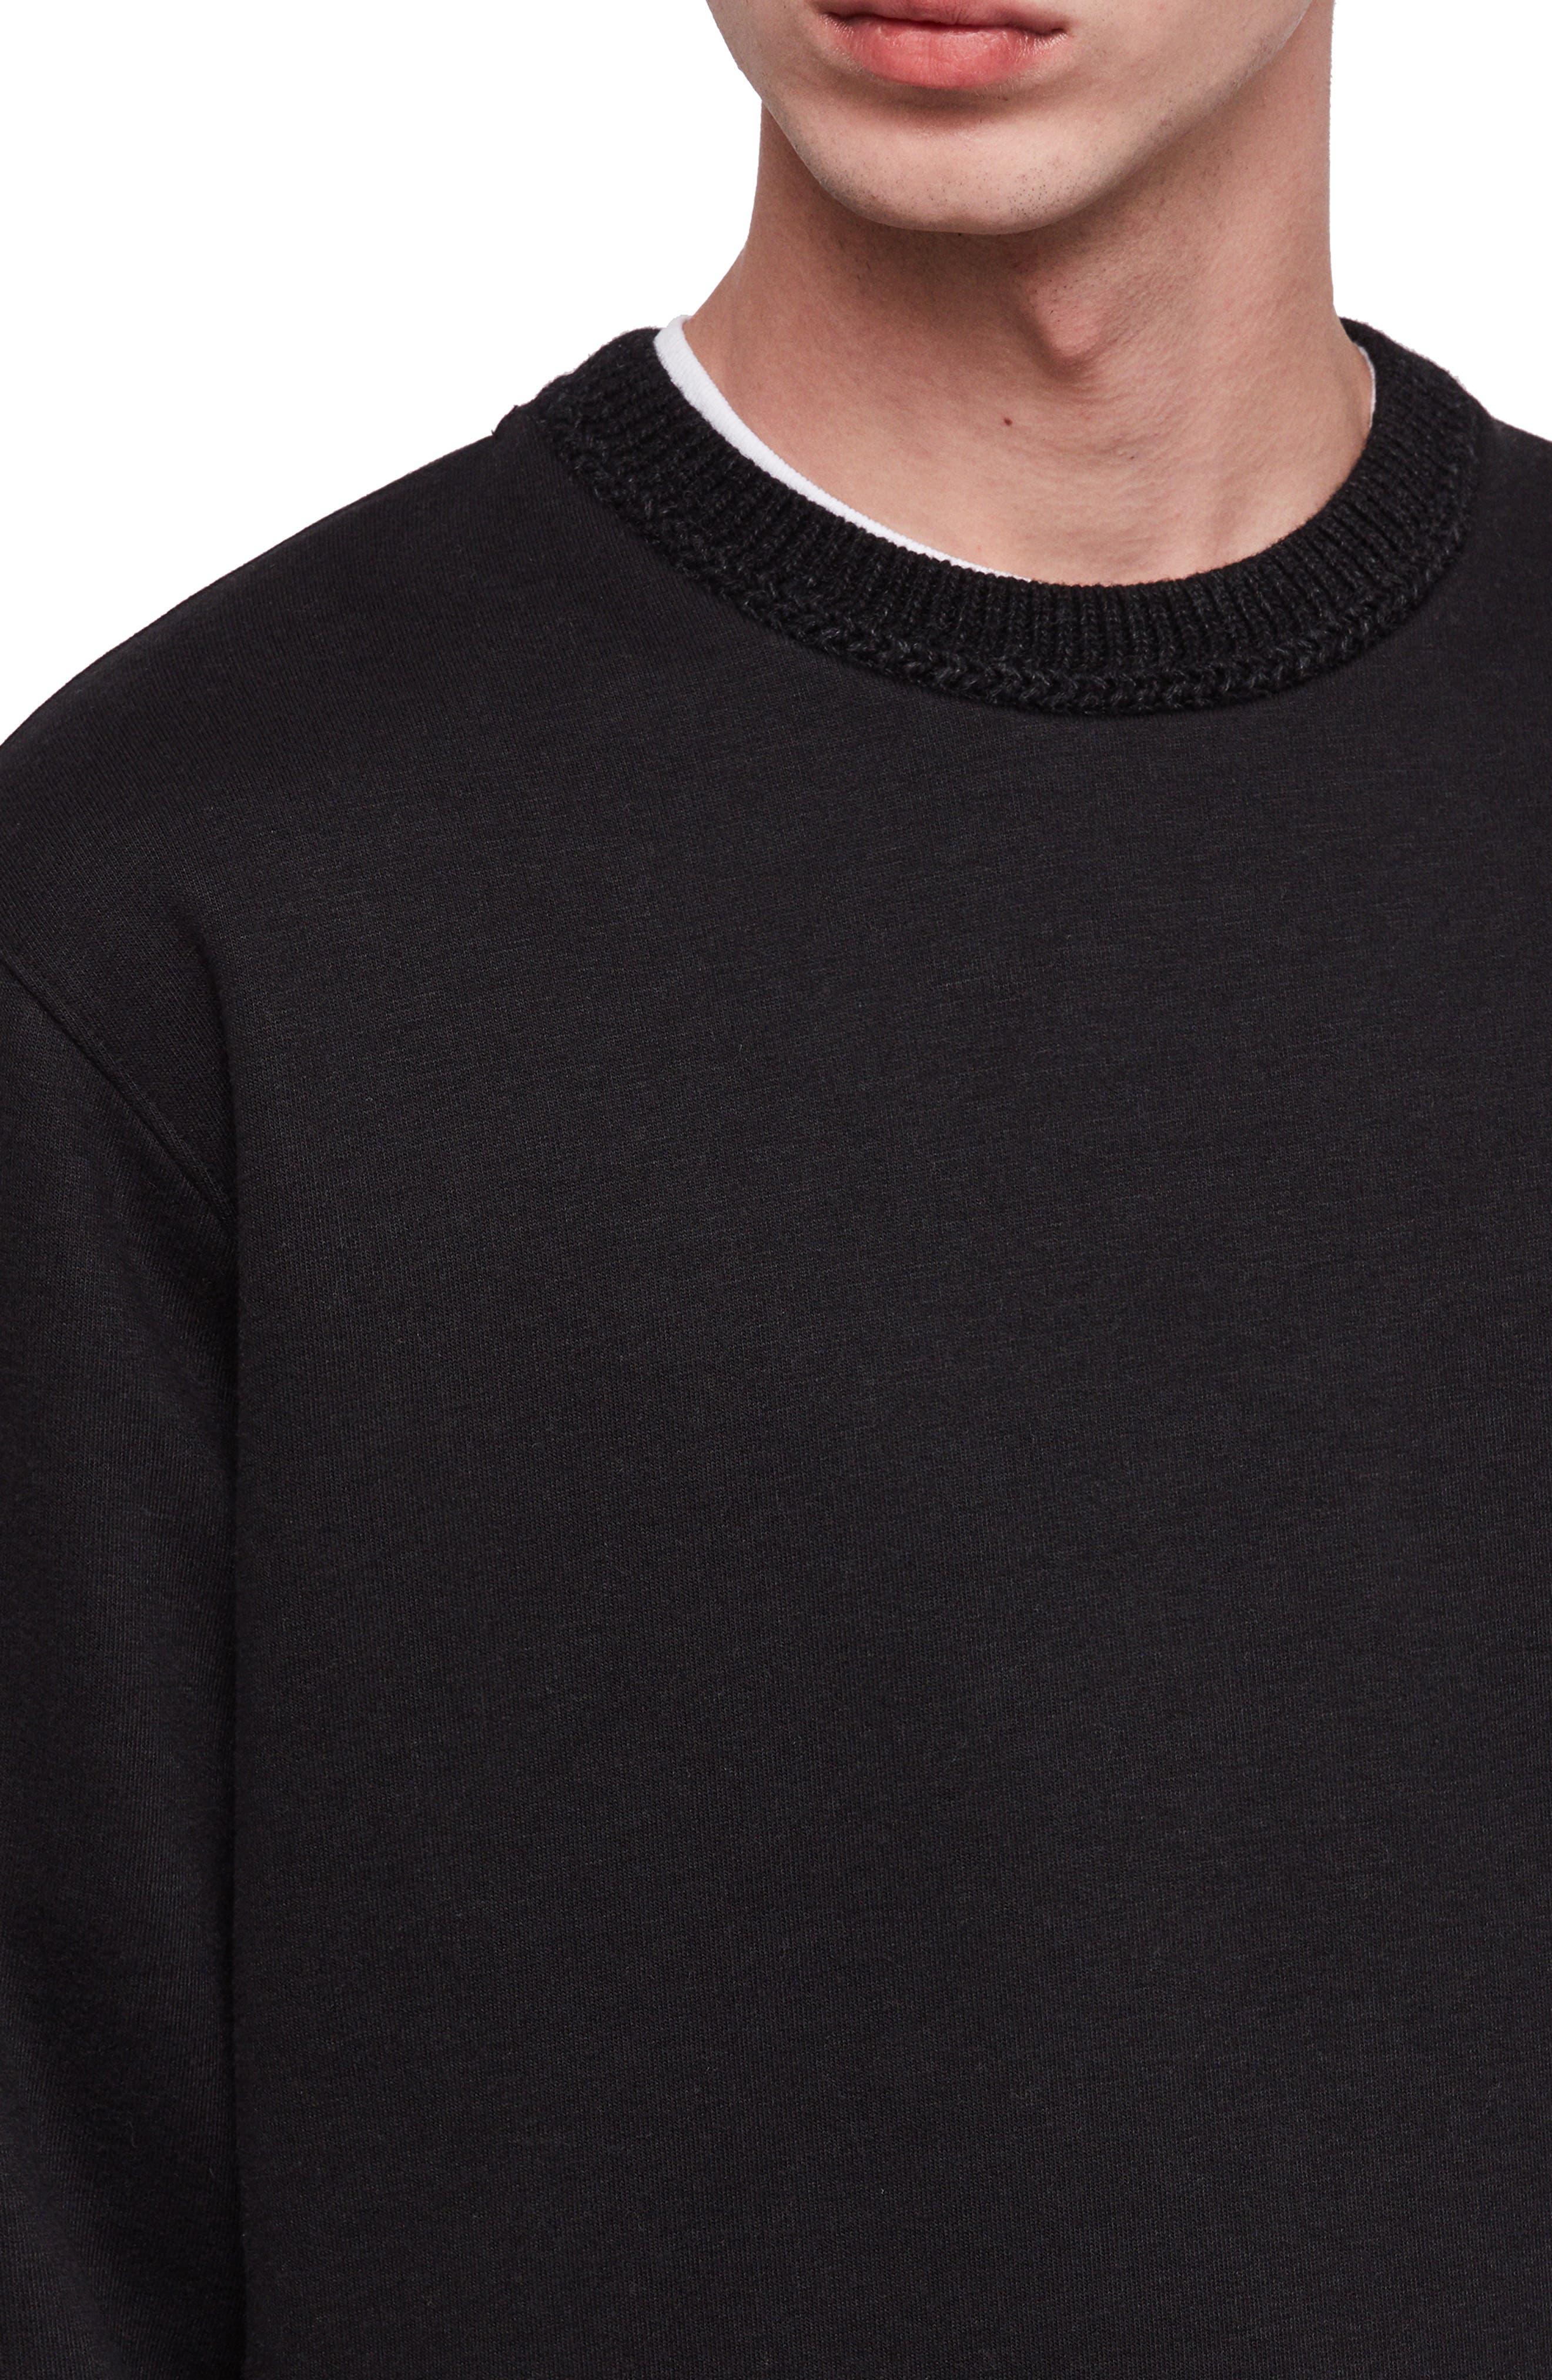 Senior Crewneck Regular Fit Sweatshirt,                             Alternate thumbnail 3, color,                             003